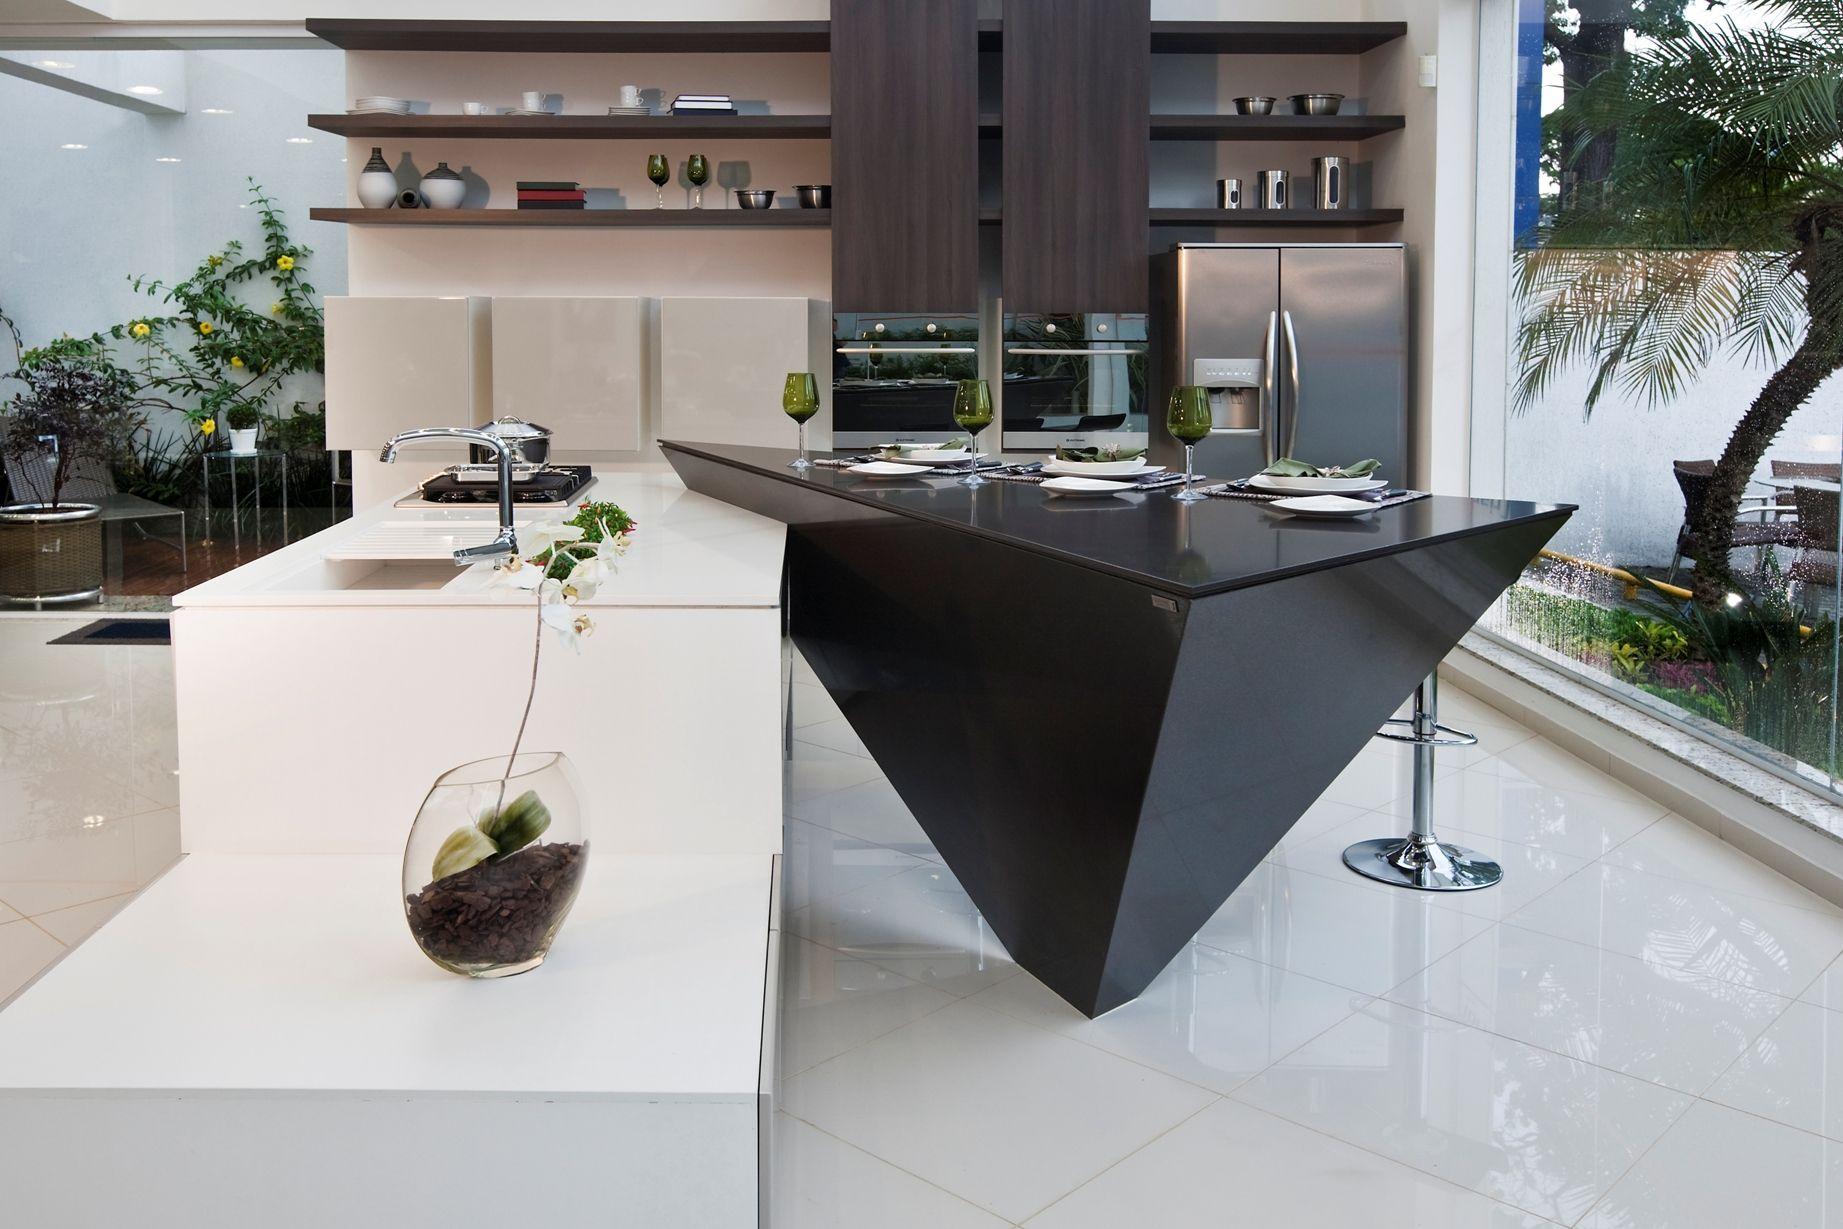 Silestone Blanco Zeus and Tao concept kitchen